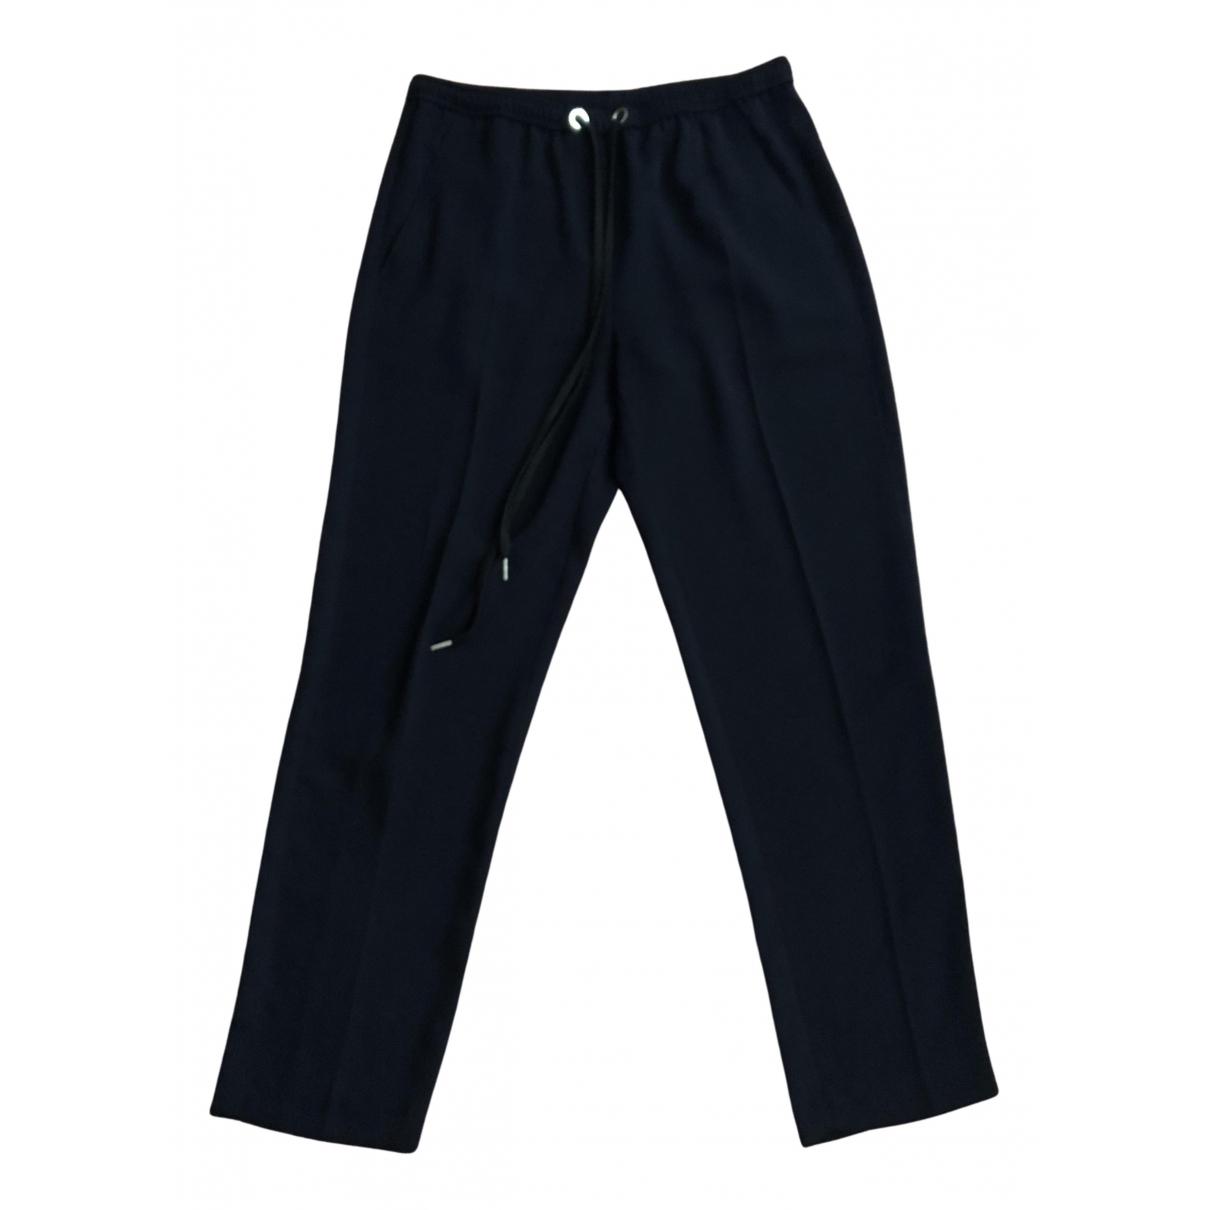 Intrend \N Blue Trousers for Women 38 IT